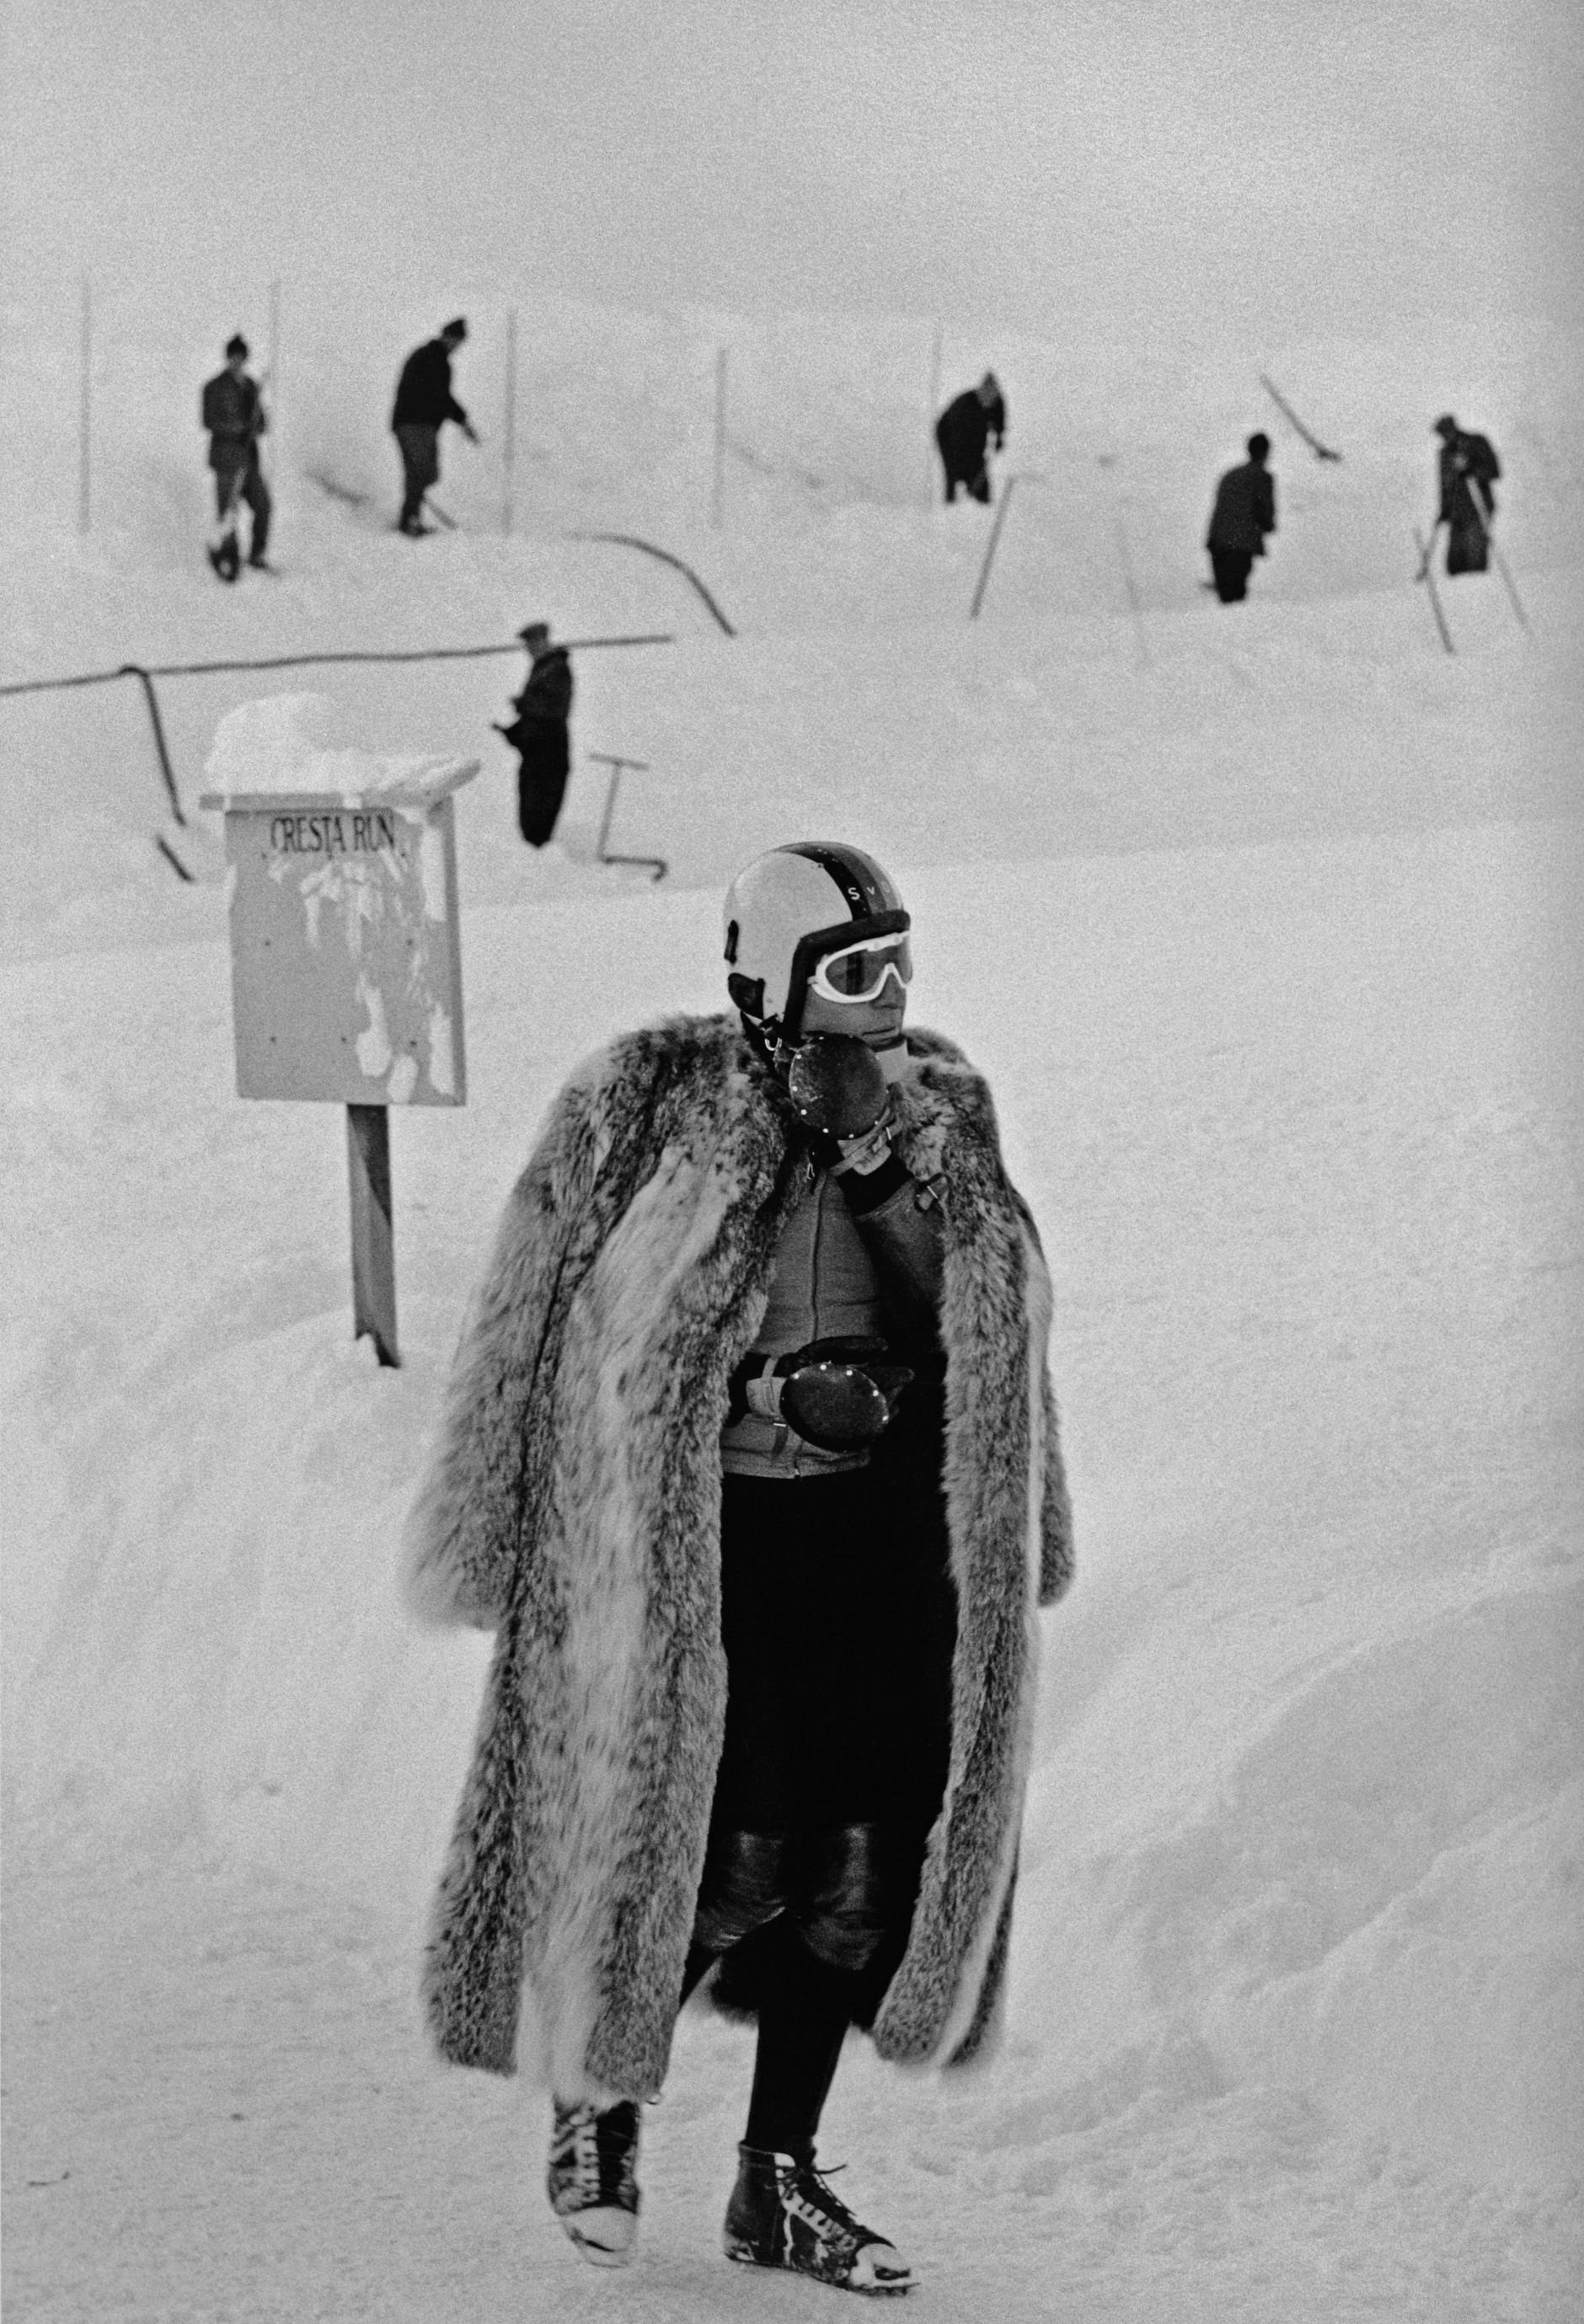 Thomas Hoepker: Gunter Sachs im Pelzmantel, 1966. © Thomas Hoepker/Magnum Photos